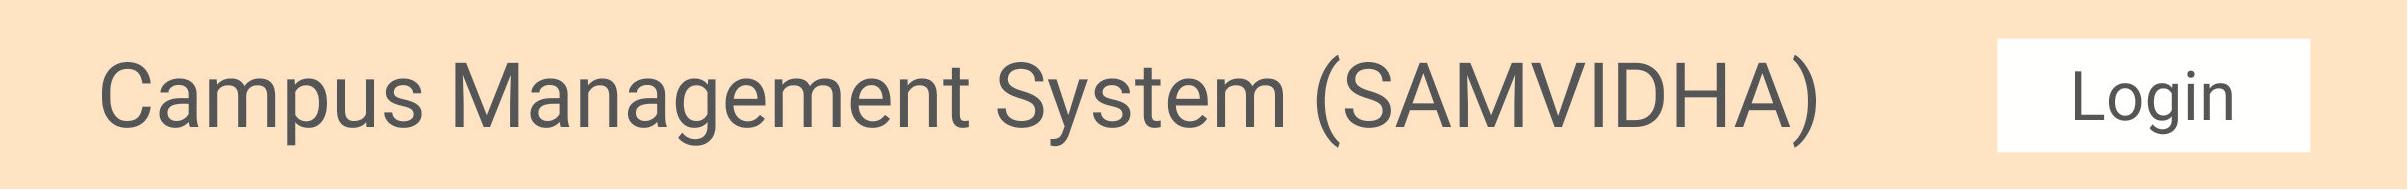 Samvidha - Campus Management System